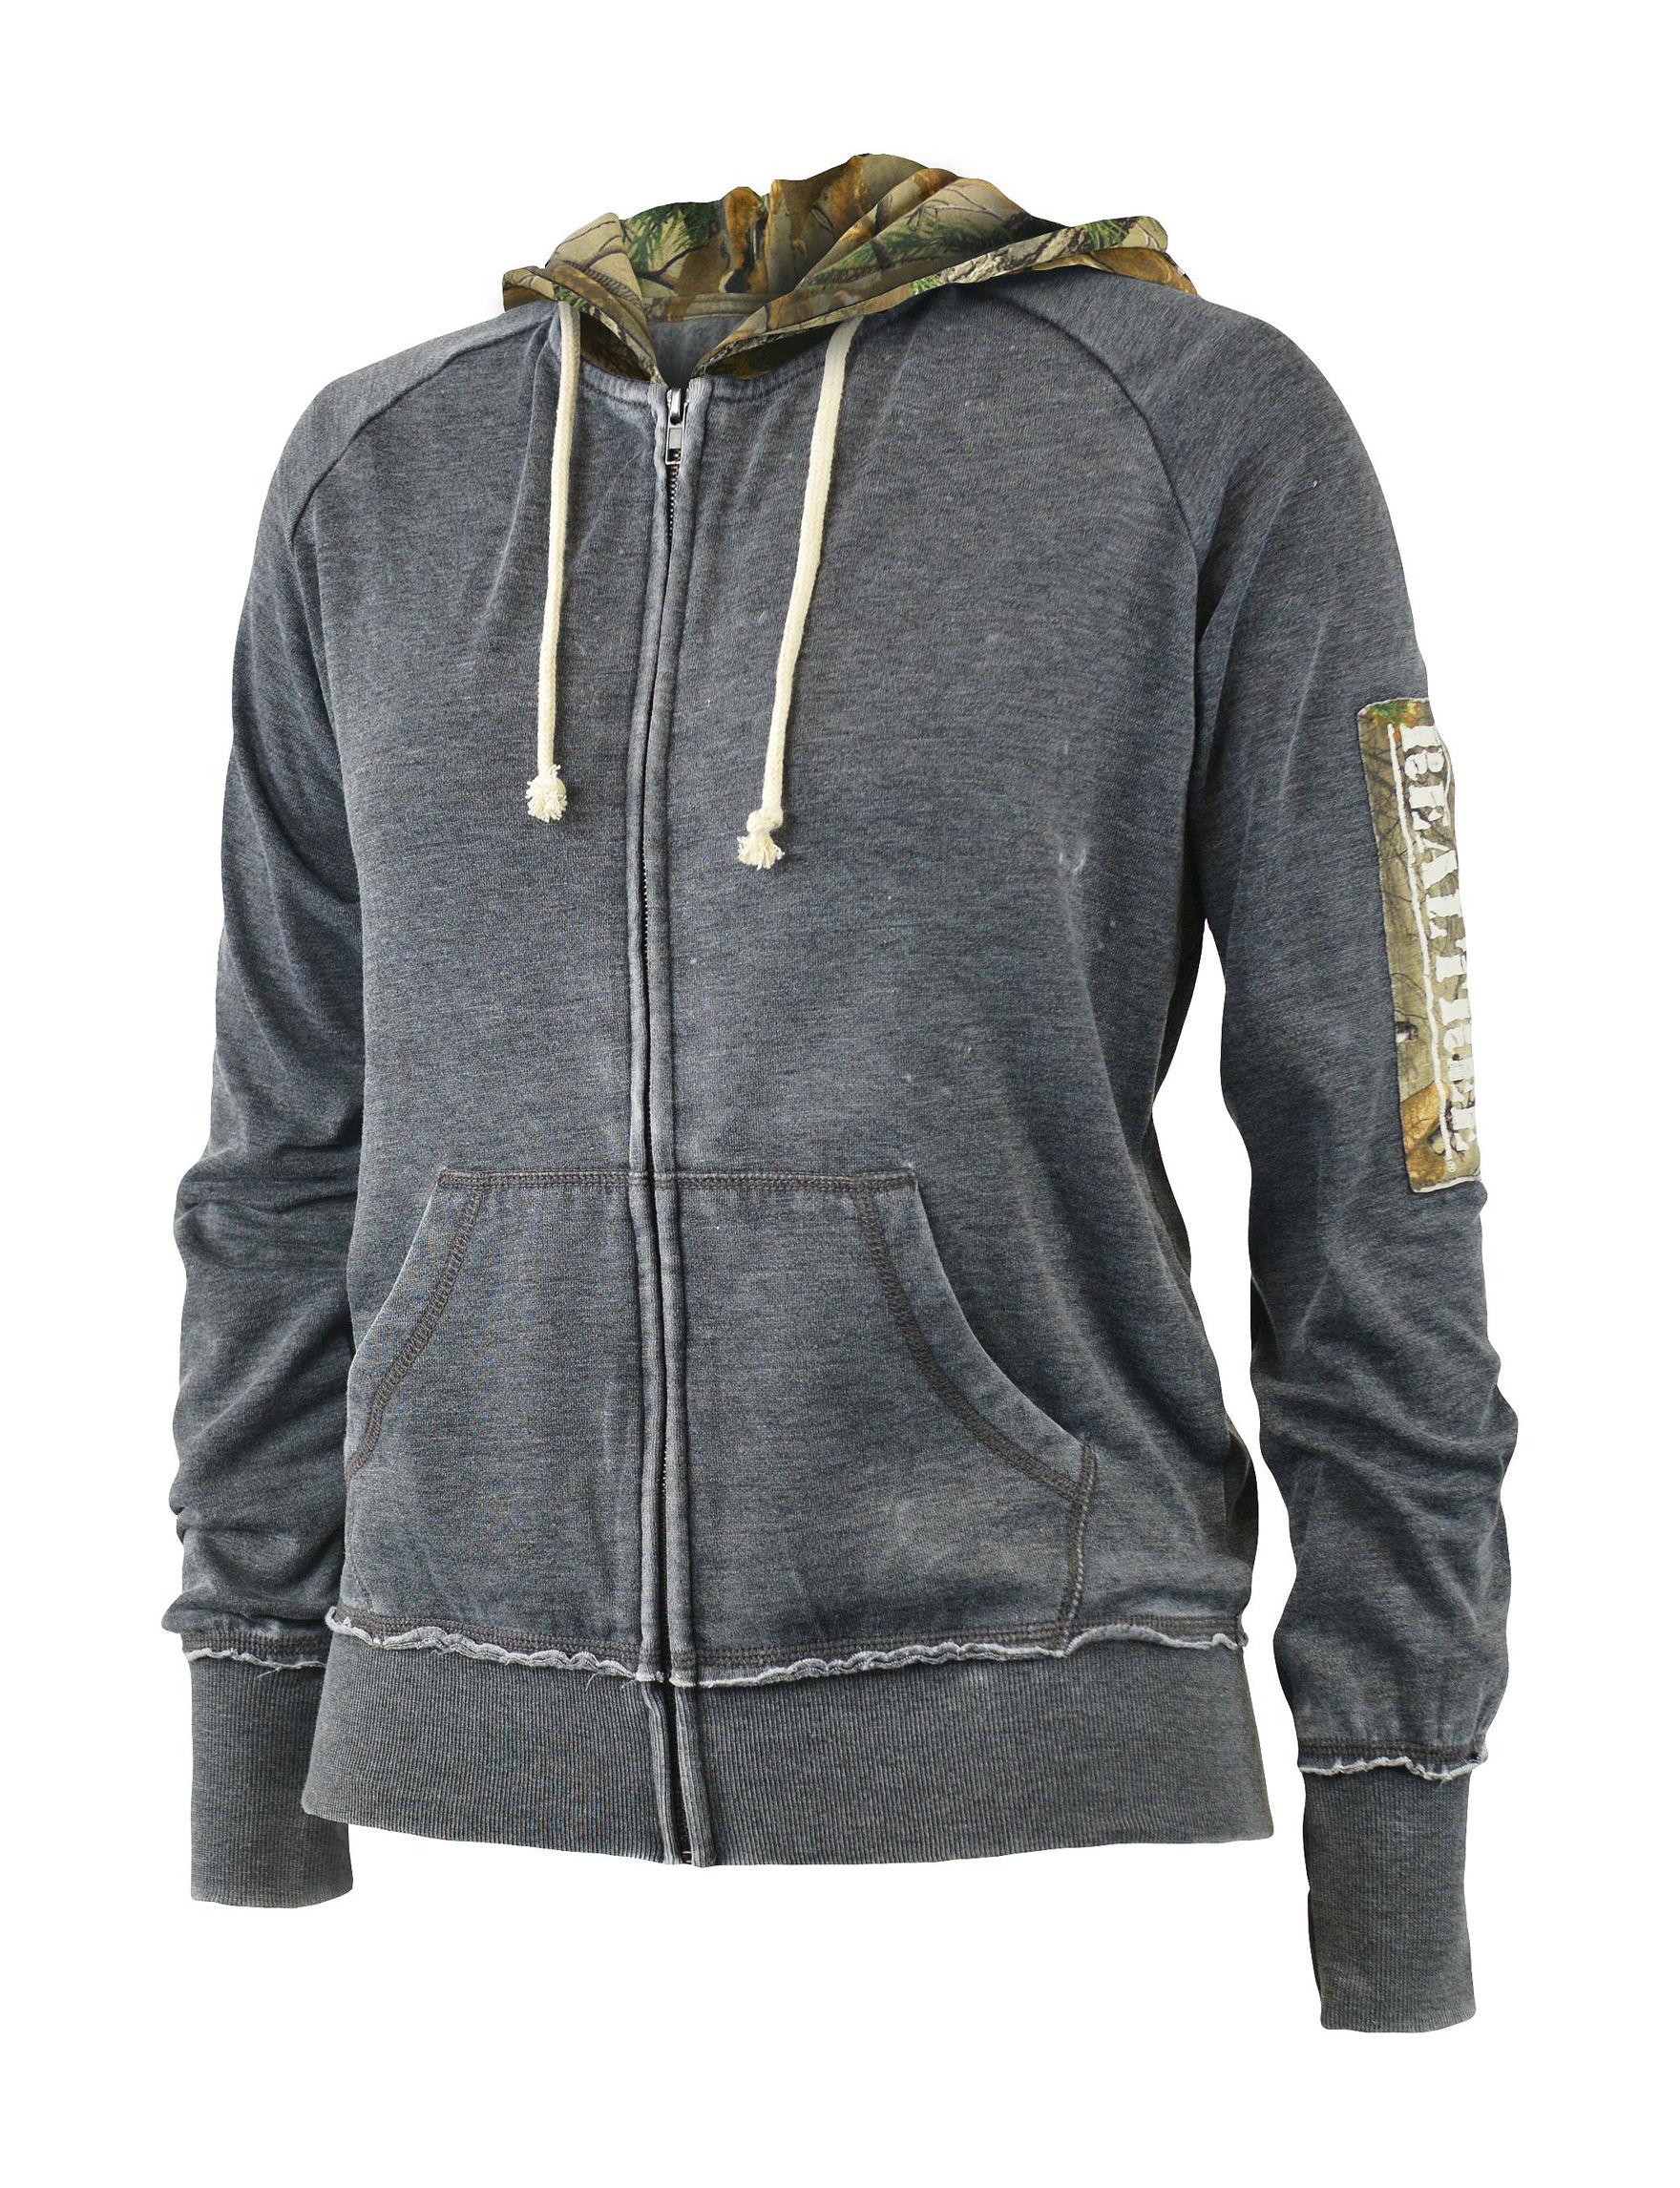 Realtree Black Lightweight Jackets & Blazers